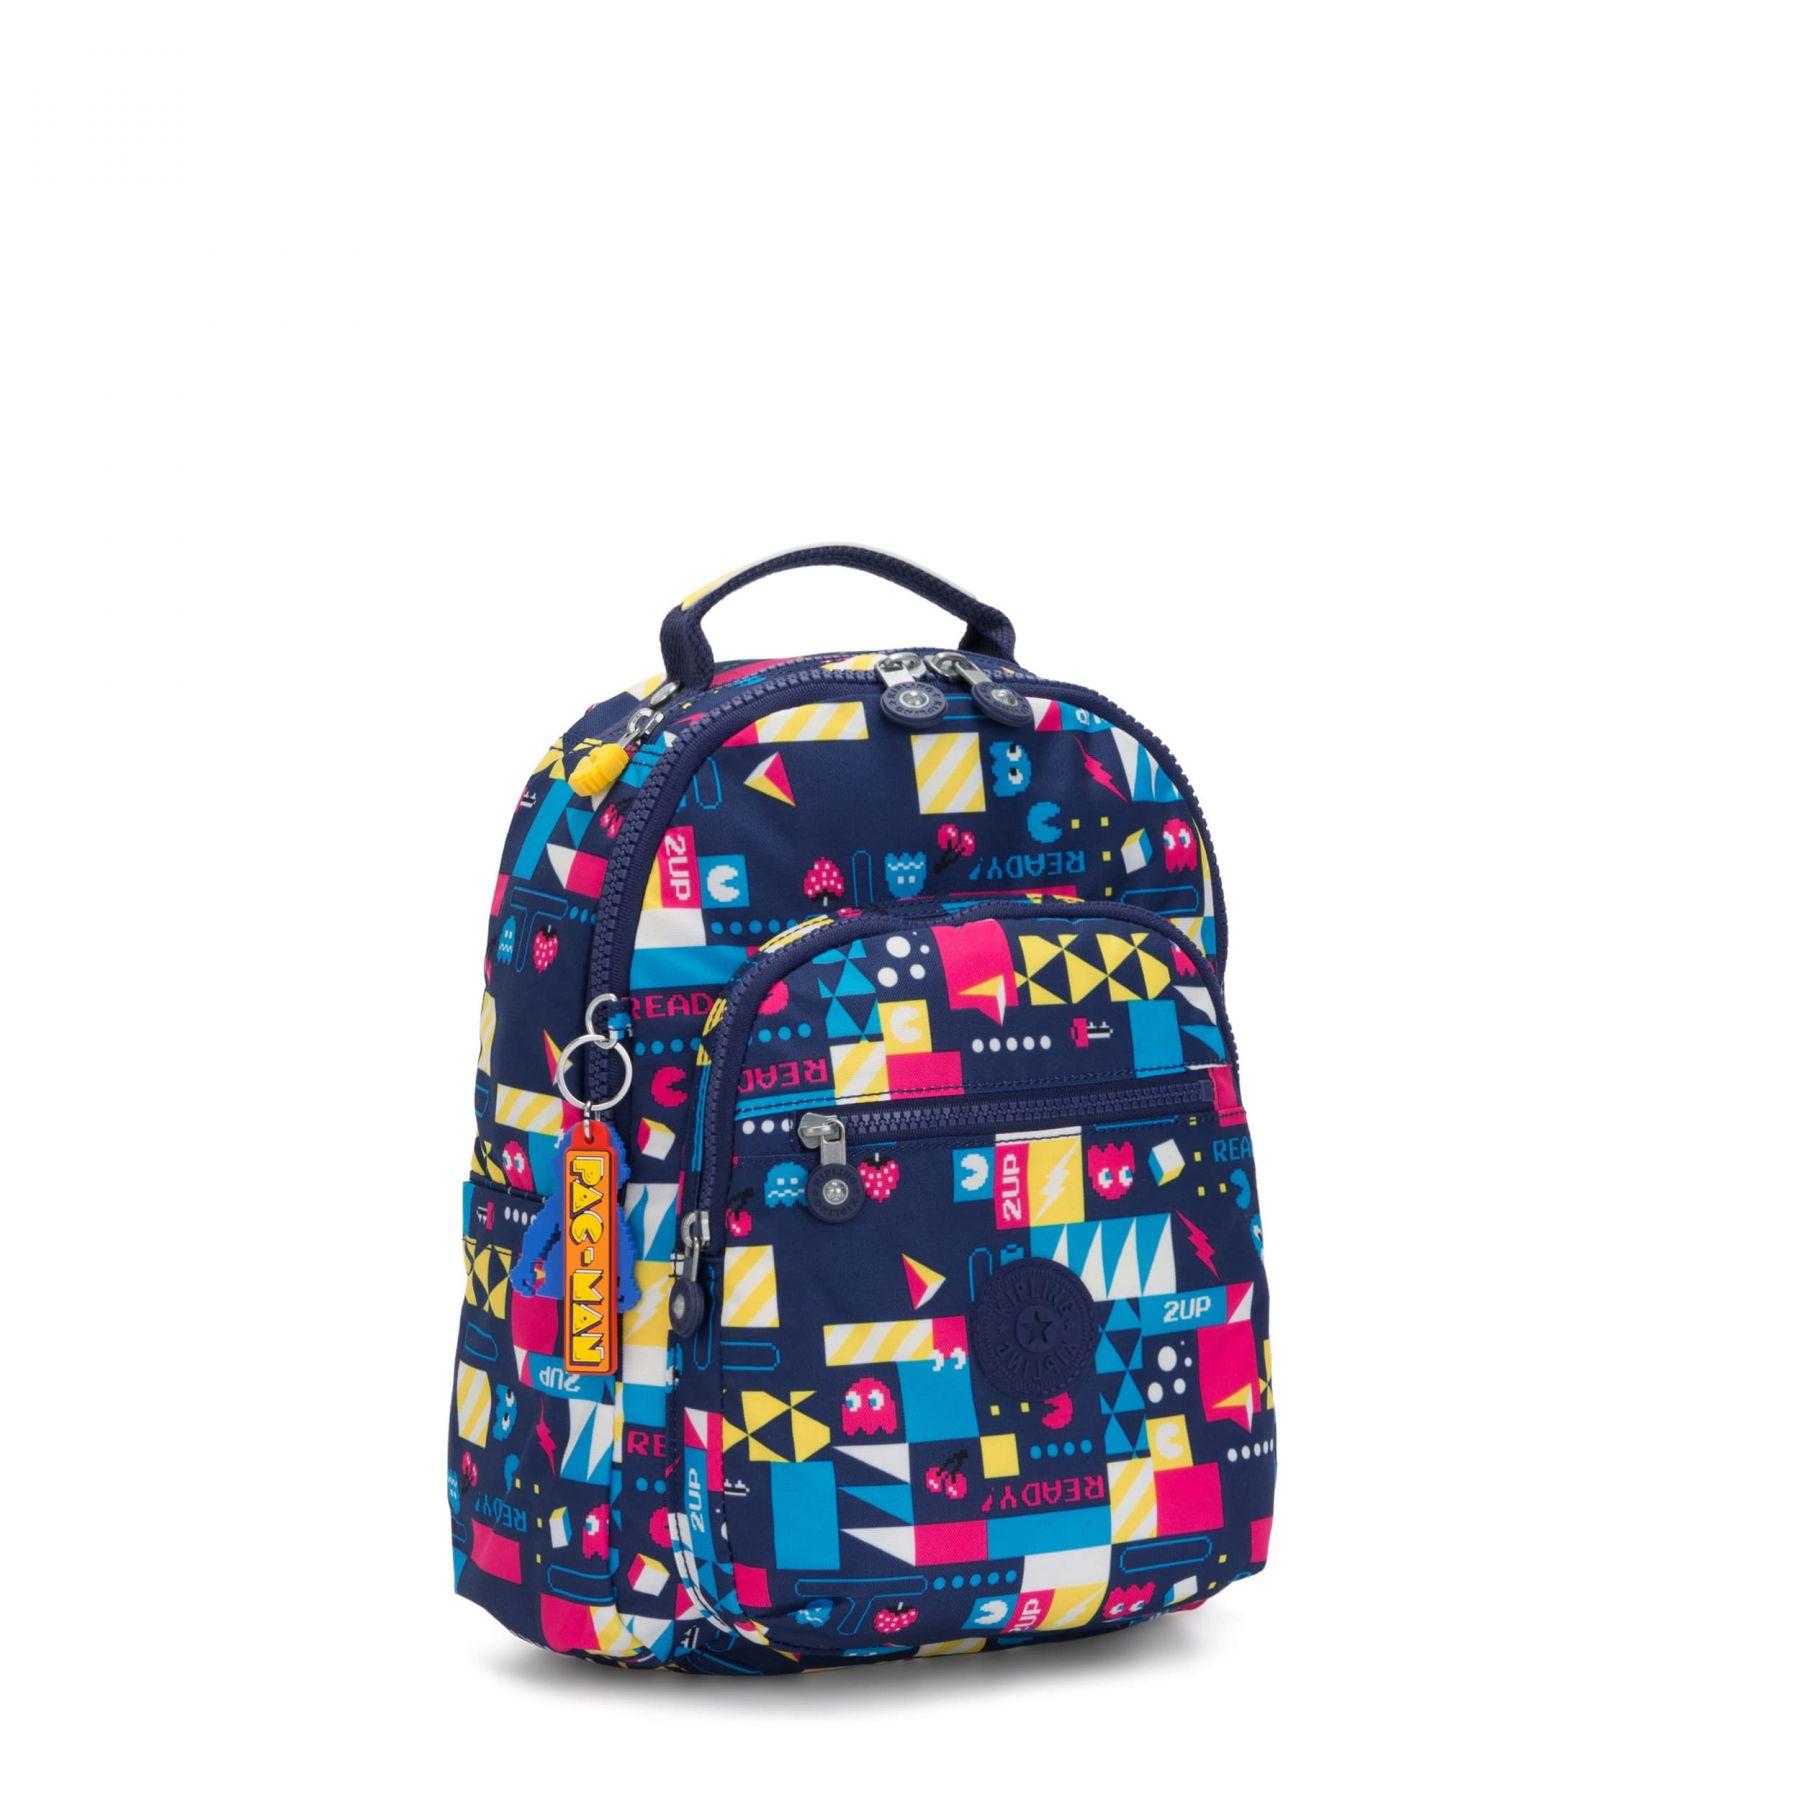 SEOUL S Latest Backpacks by Kipling